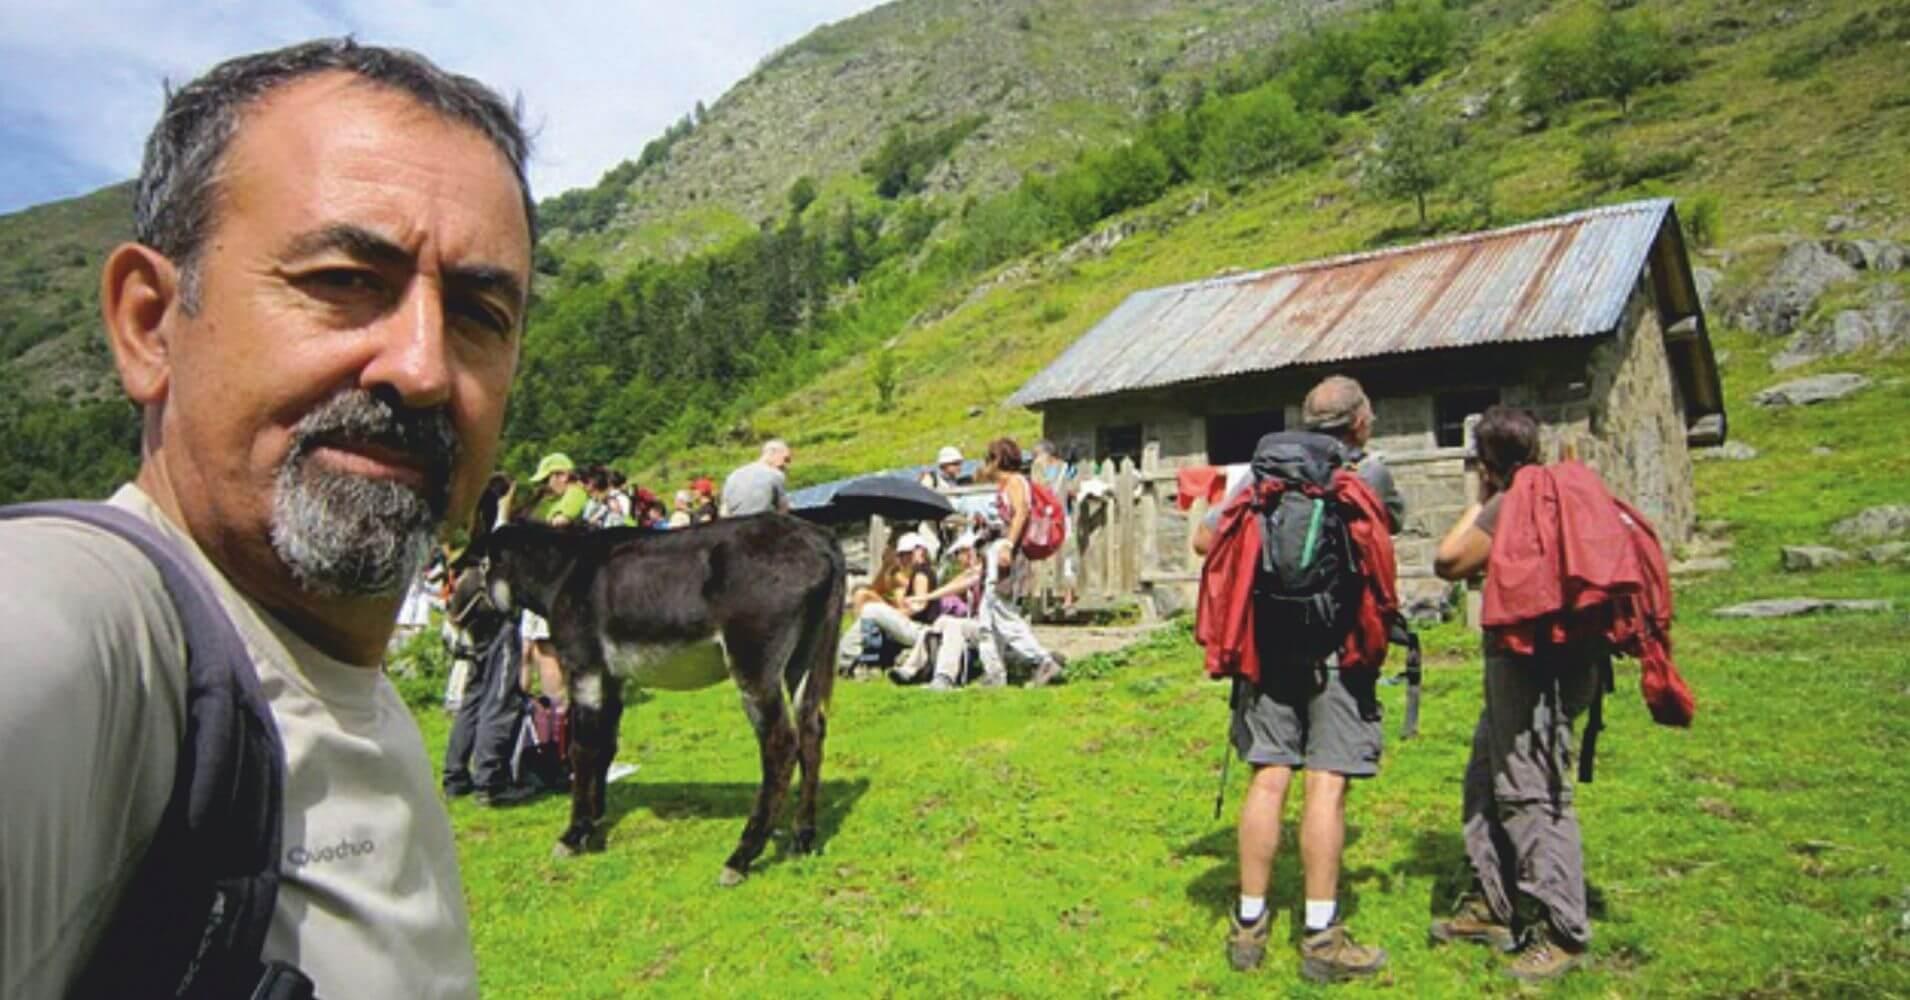 Cabaña de la Baigt de St. Cours. Valle de Aspe. Etsaut. Pirineos Atlánticos. Nueva Aquitania. Francia.